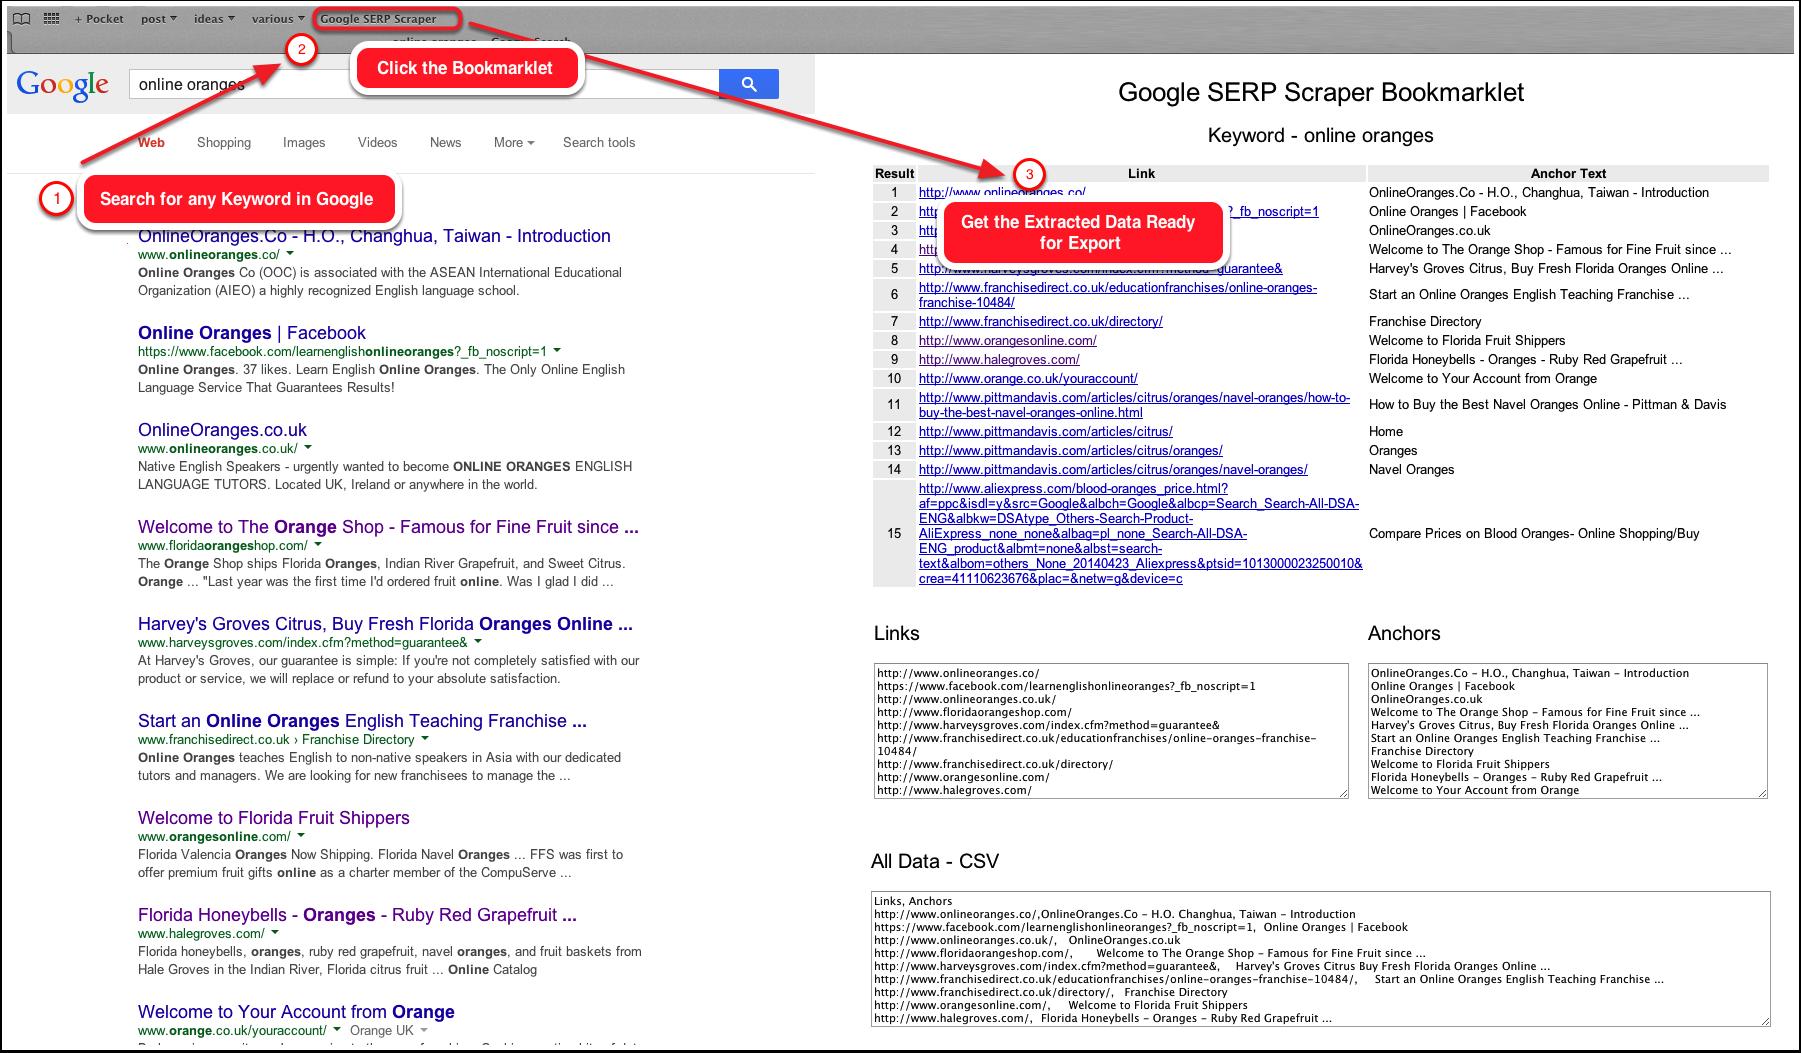 Google Serp Scraper Bookmarklet